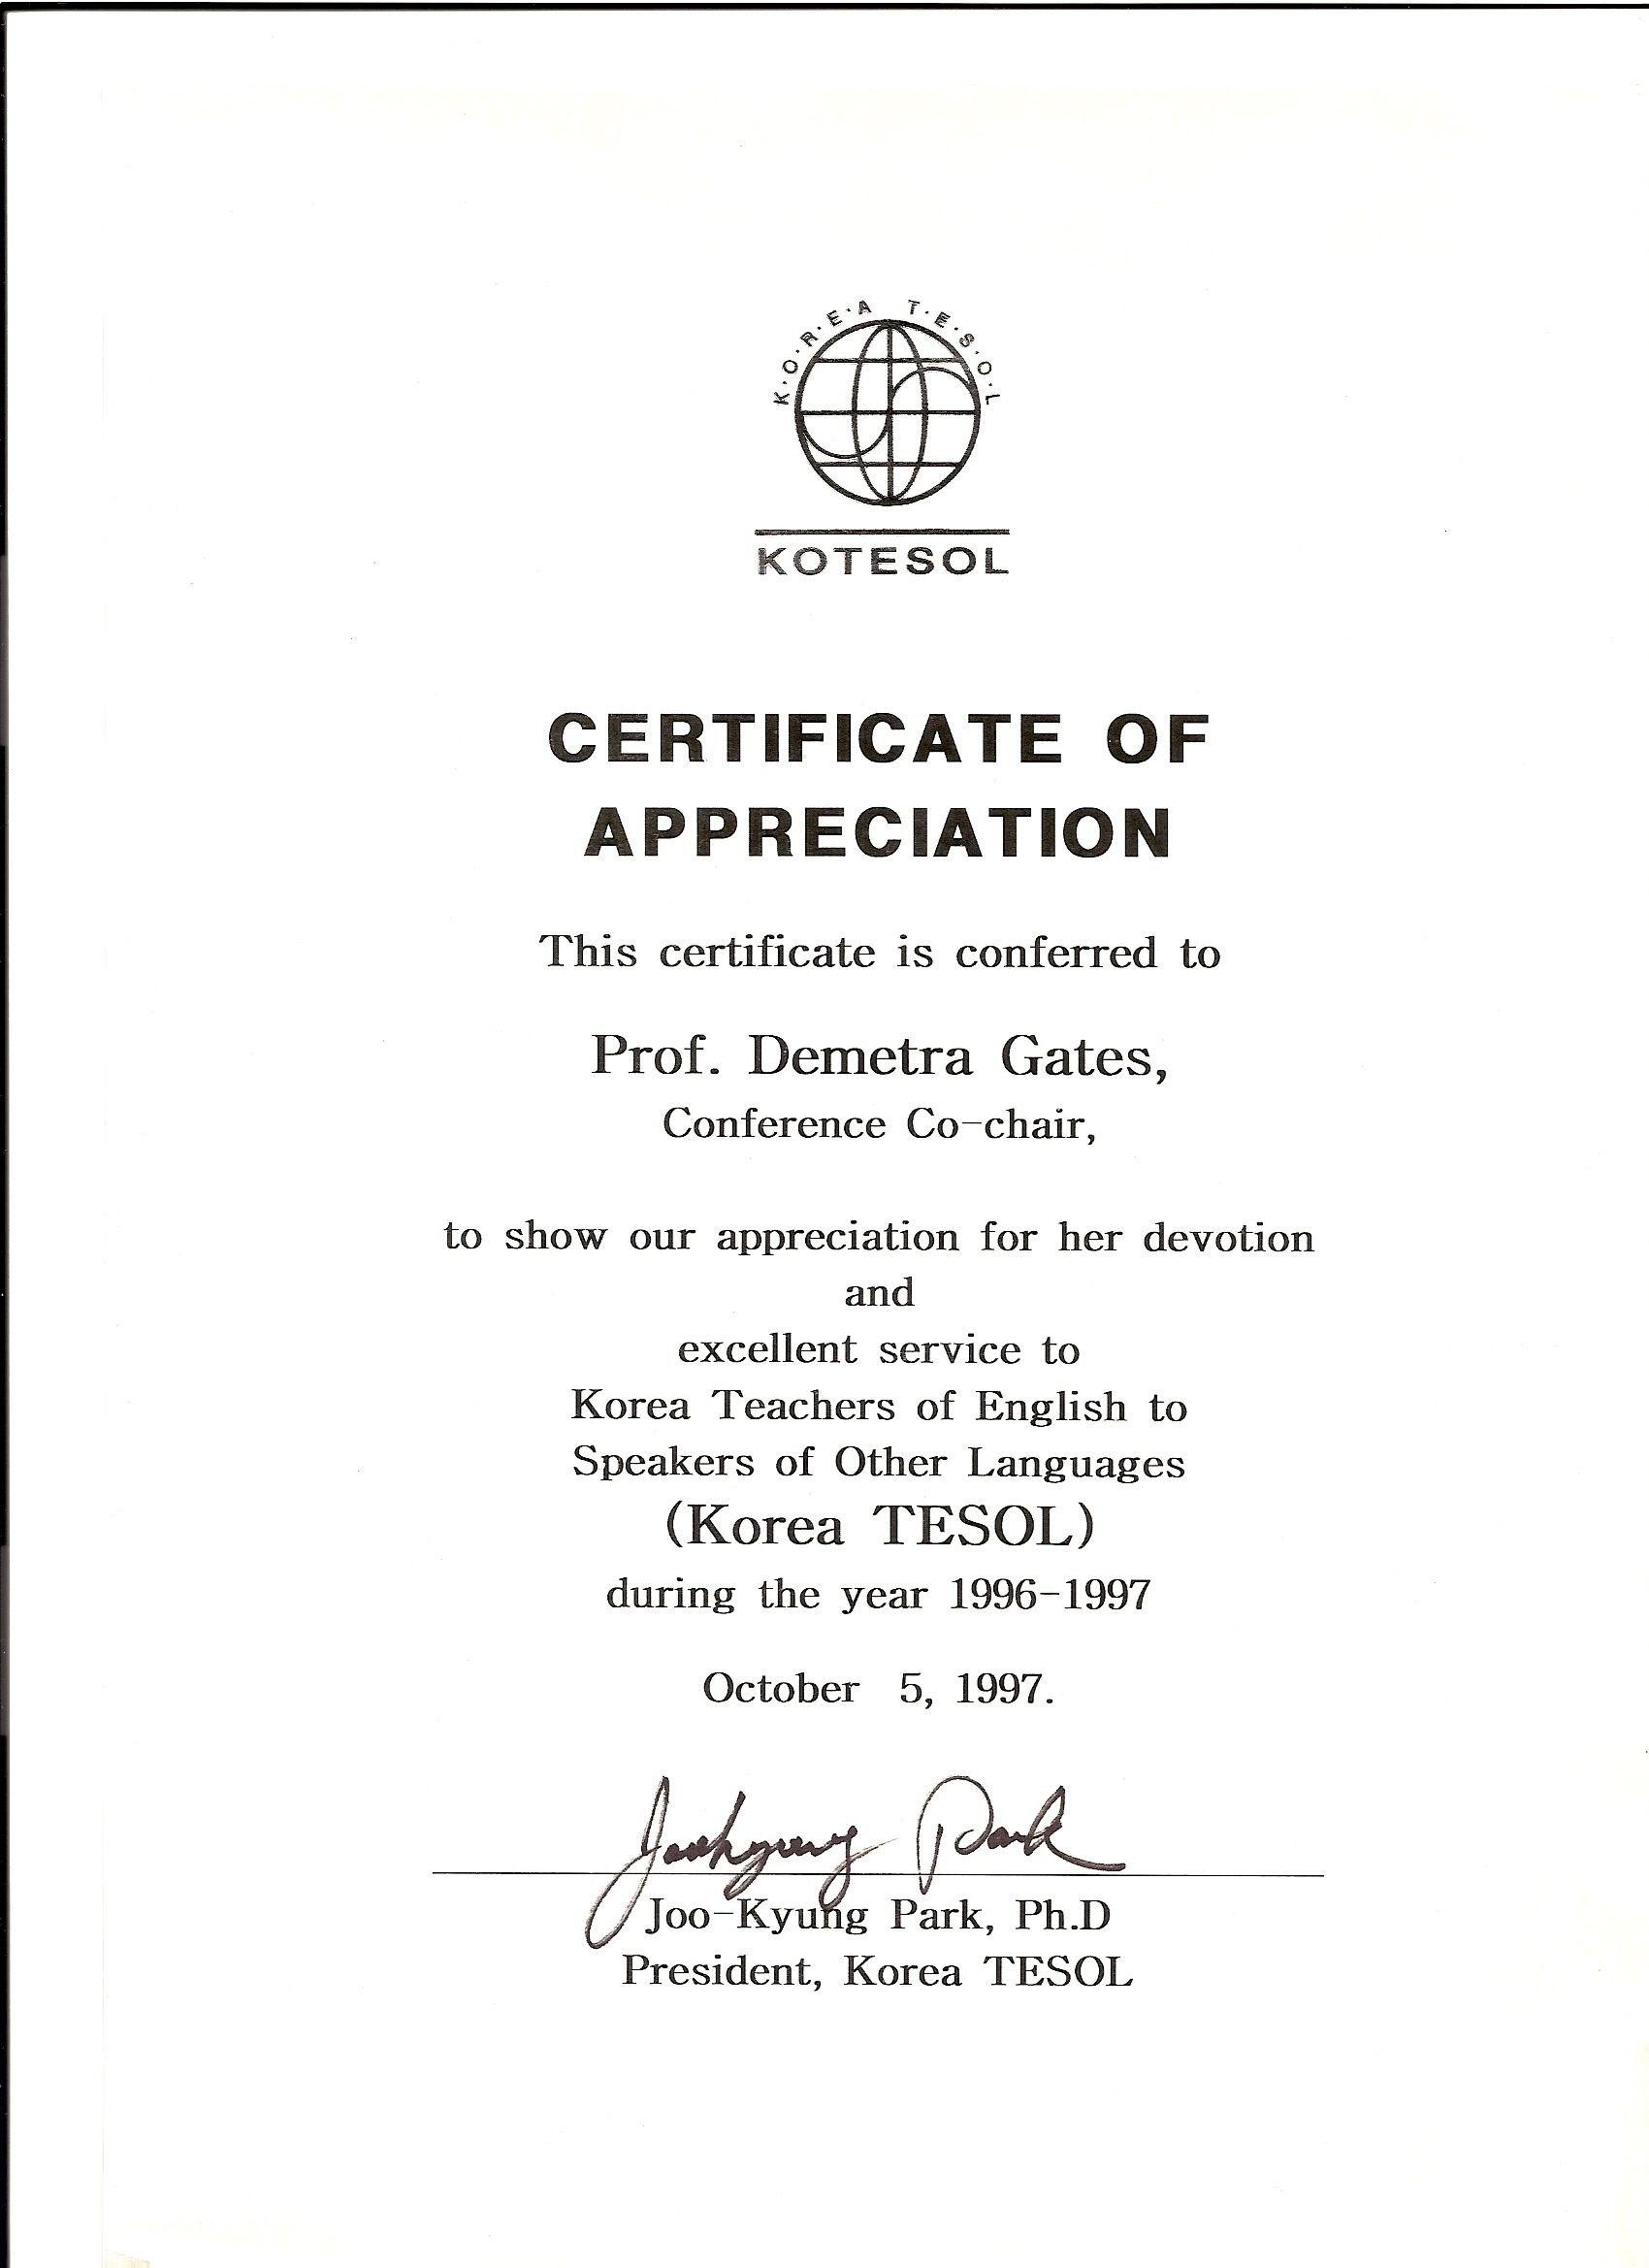 Kotesol Presidential Certificate Of Appreciation  Conference Within Army Certificate Of Appreciation Template